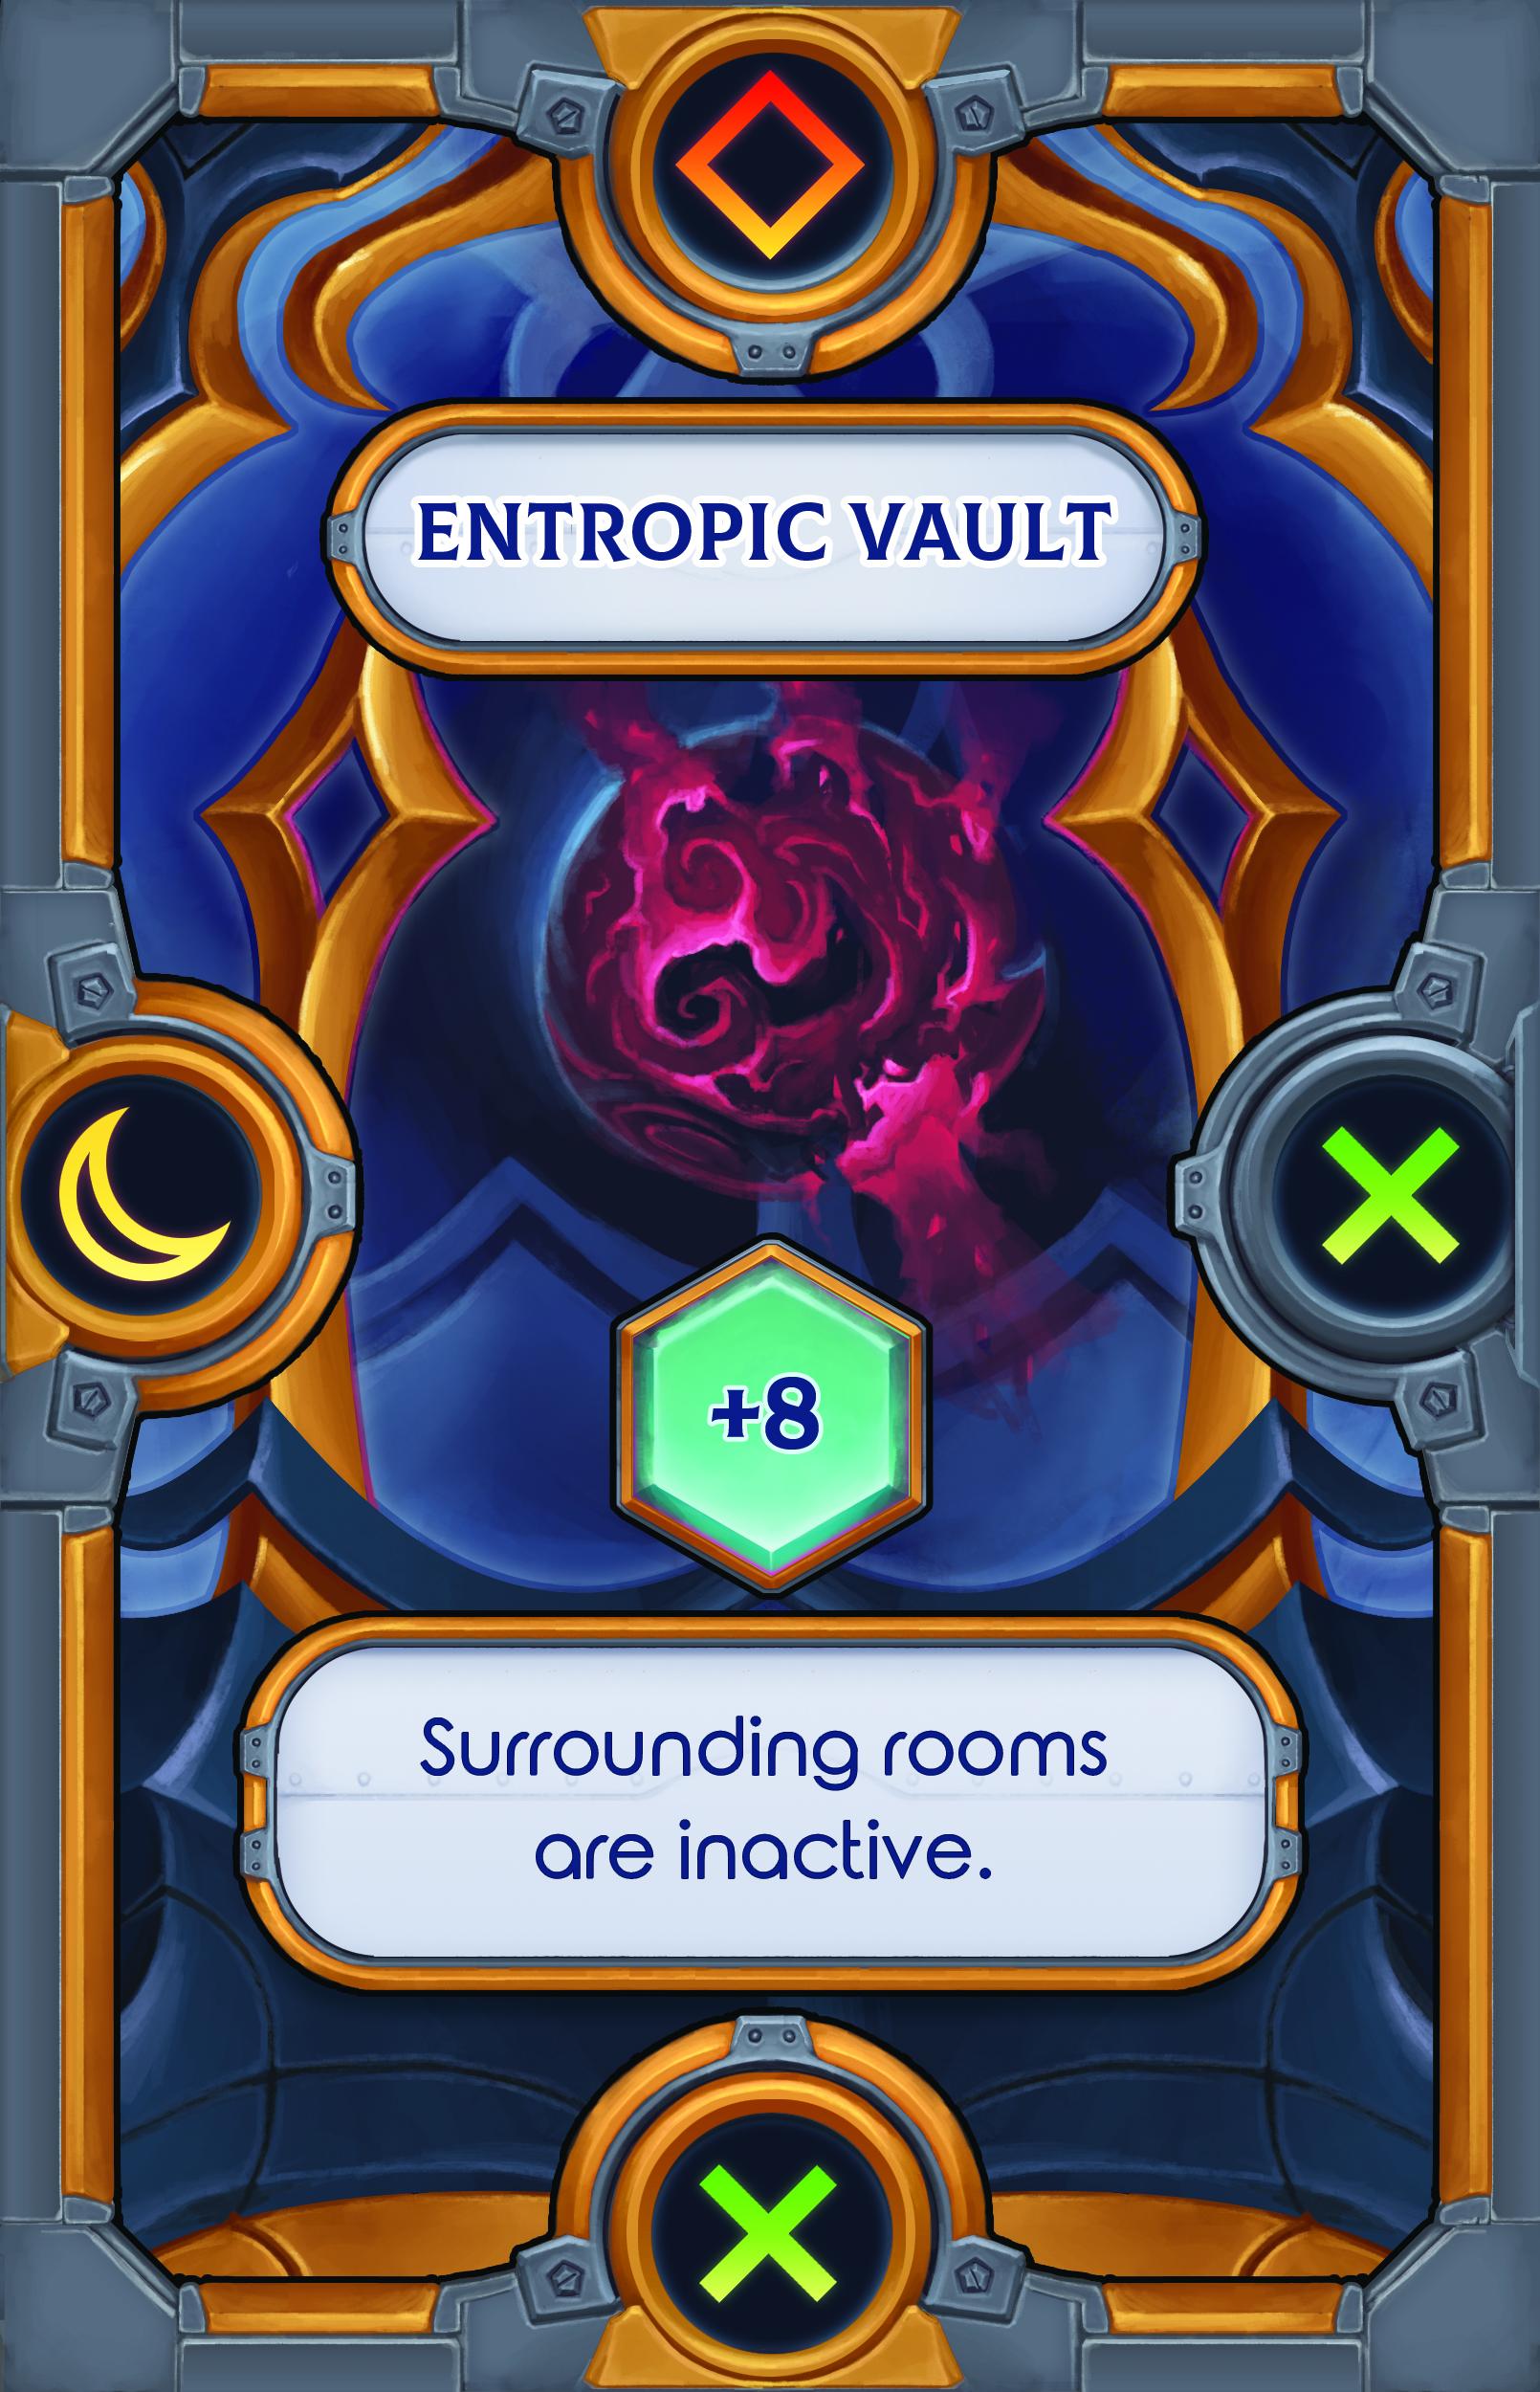 Entropic Vault